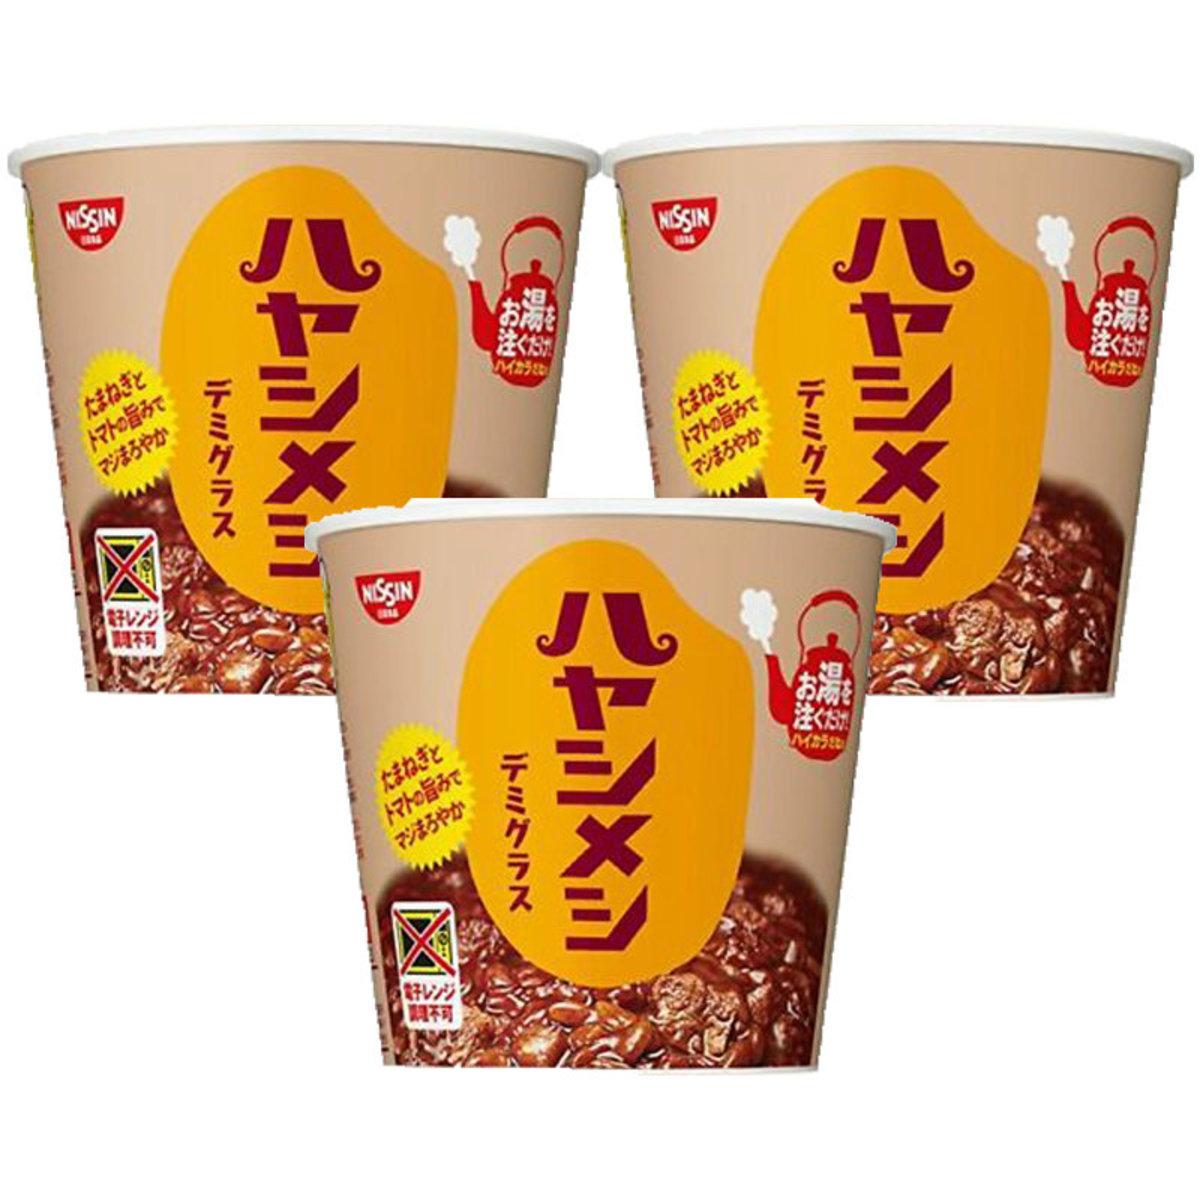 Hayashi-Meshi 濃汁牛肉燴飯 103g x 3杯 (4902105945483_3)